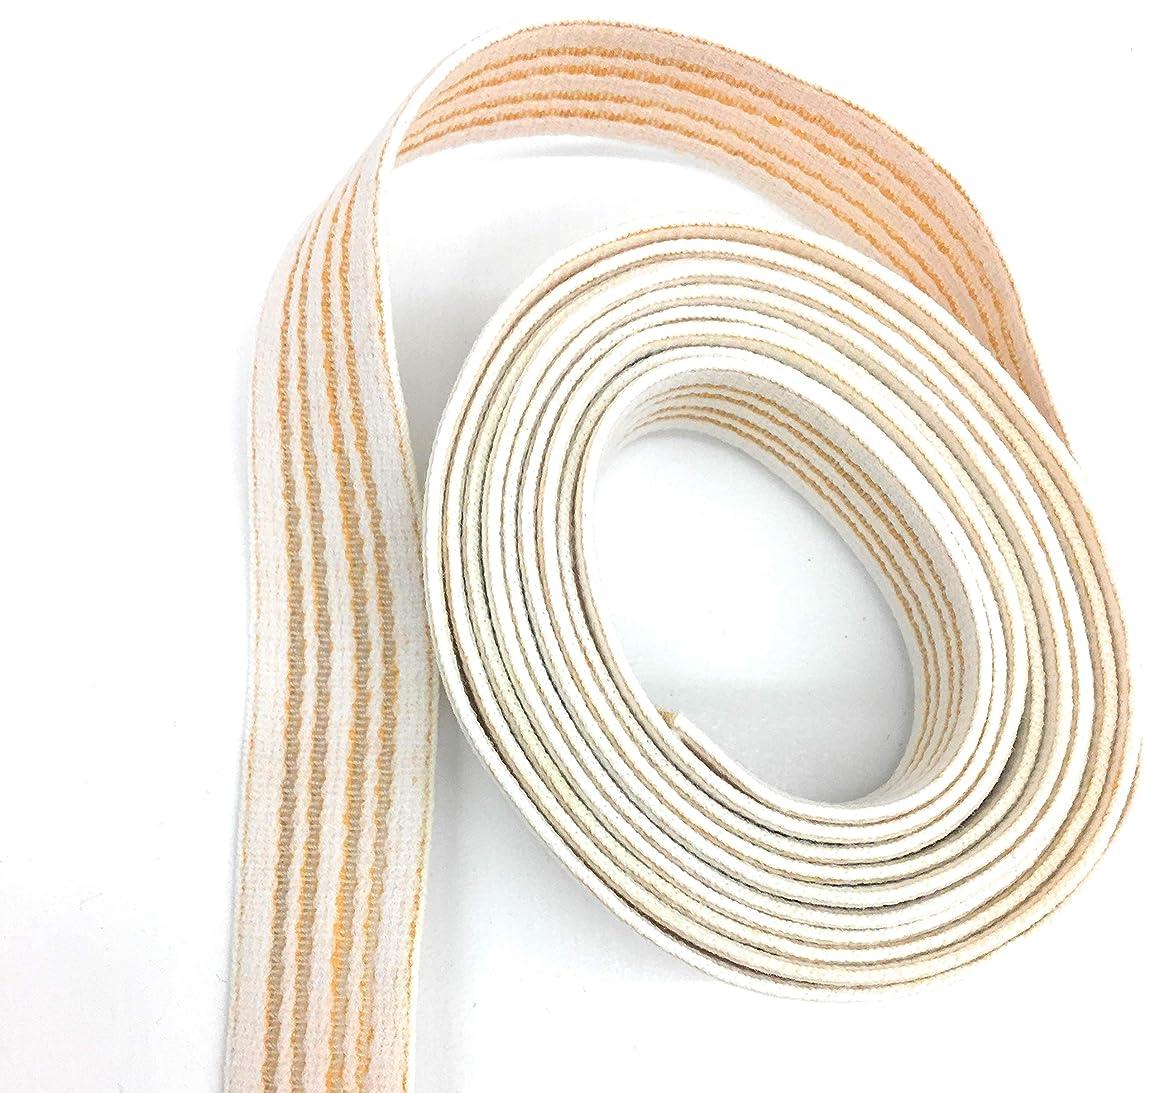 Ban Roll 7/8'' Off White Stretch Knitting Elastic Band Spool with High Elasticity- Waist Band Elastic 6 Yards